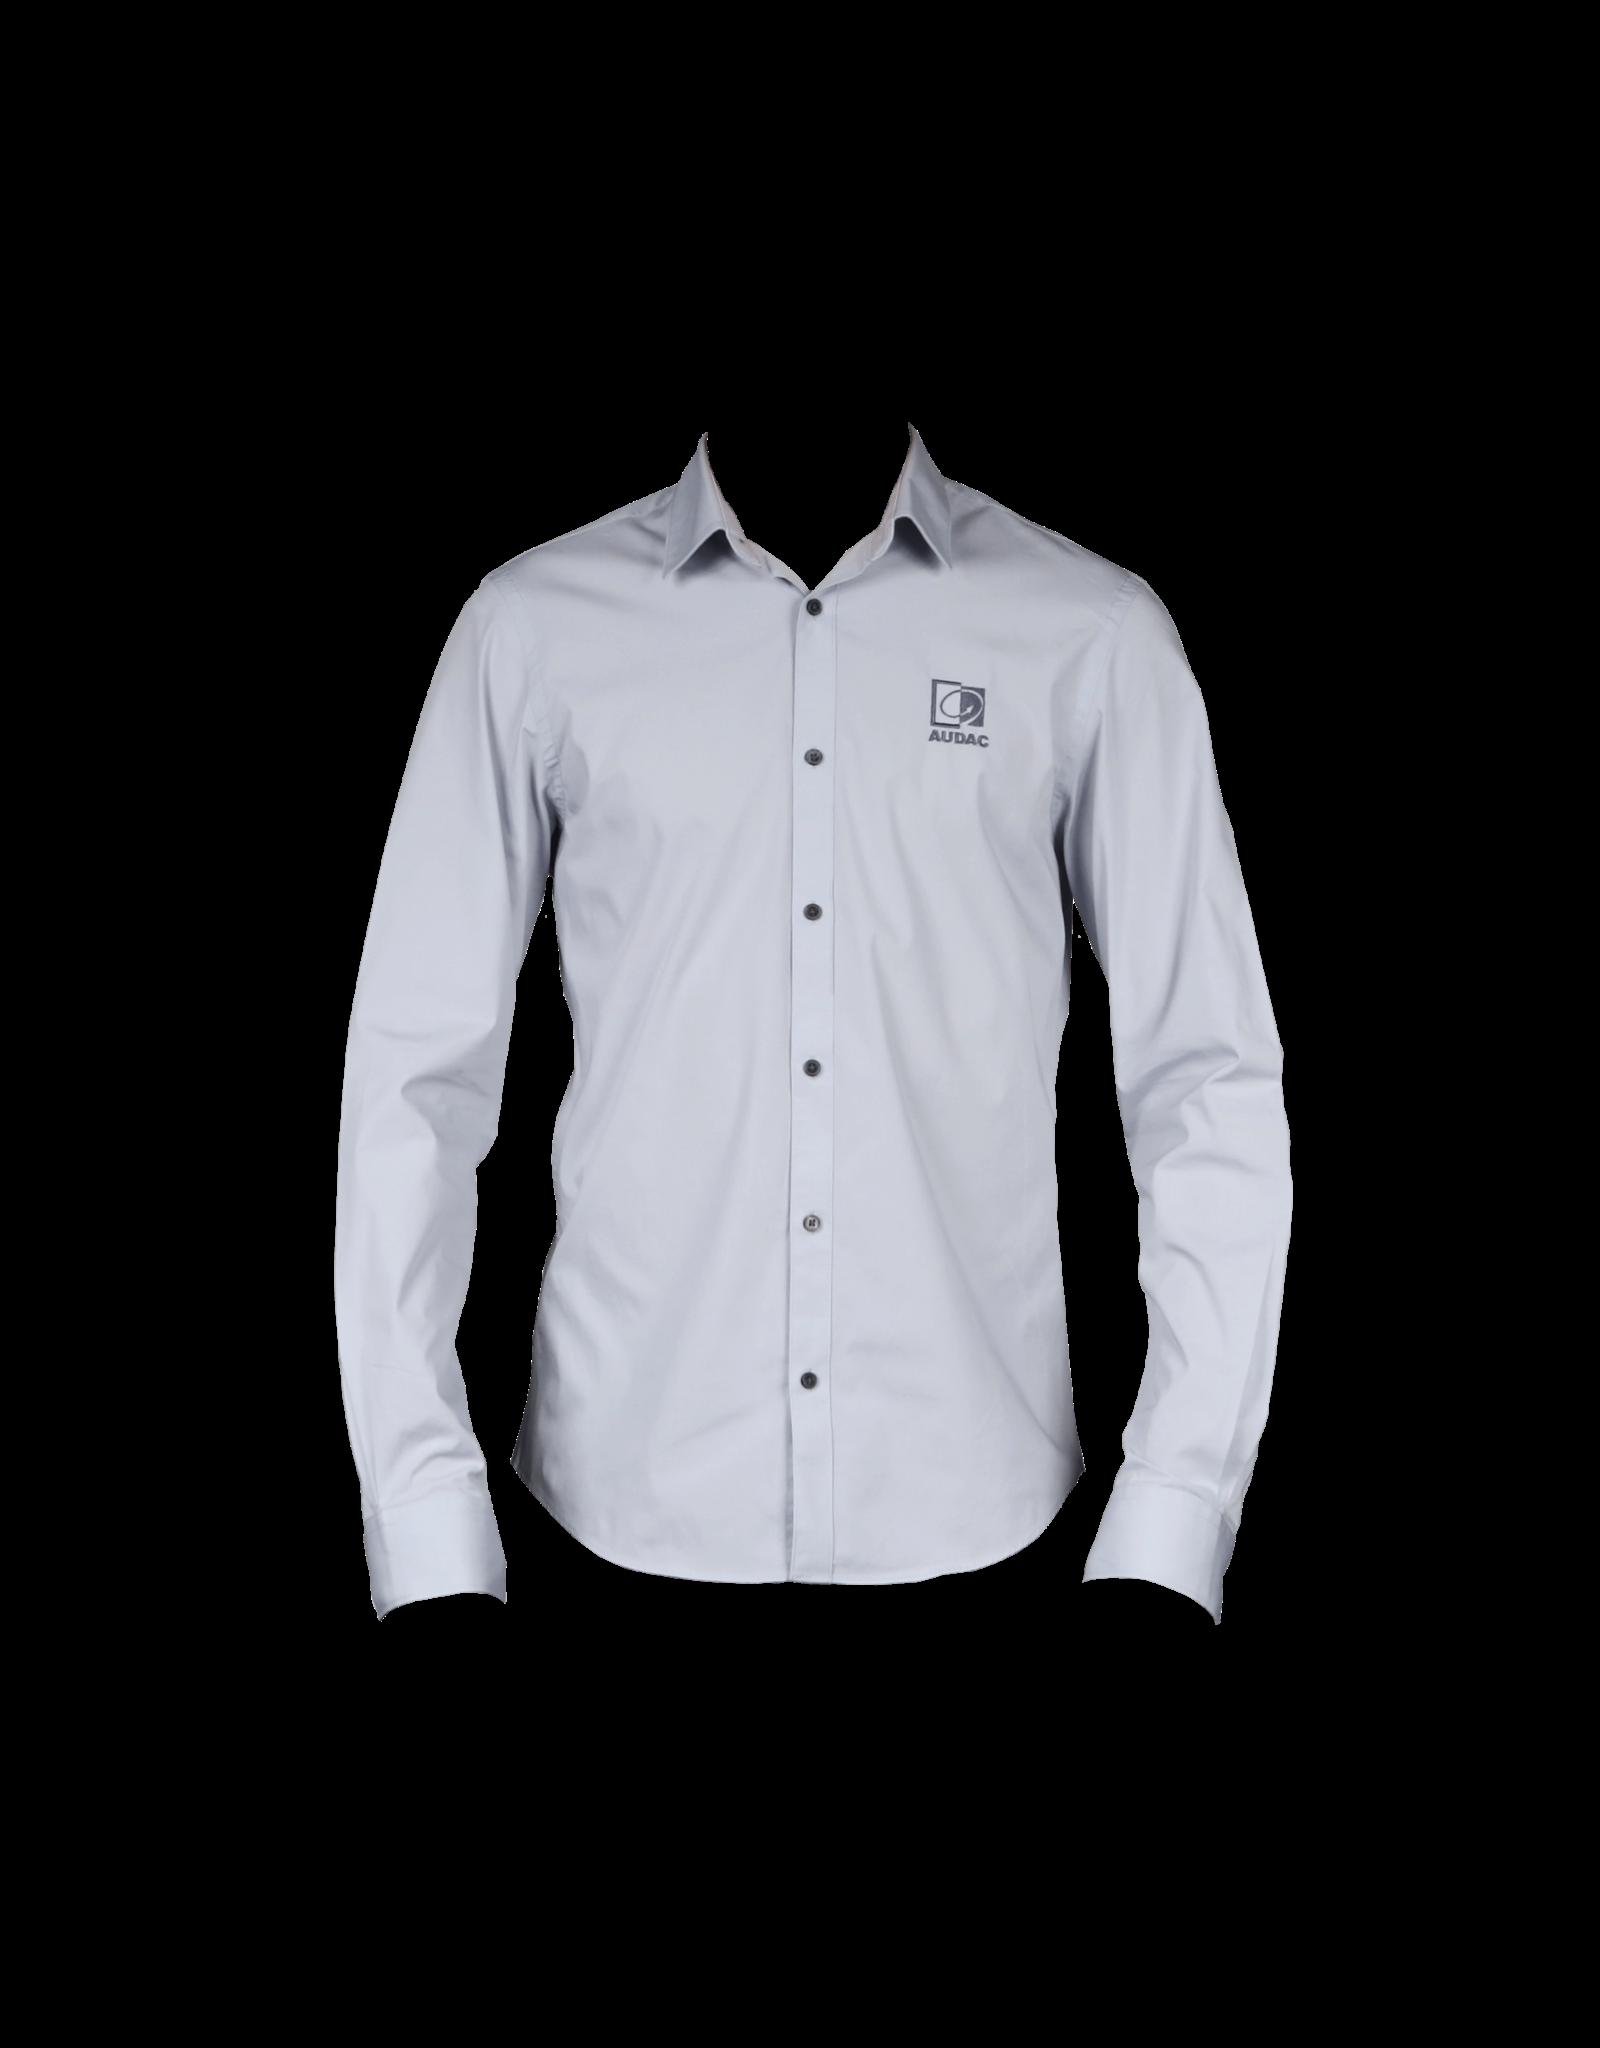 Audac Promotion shirt SMALL